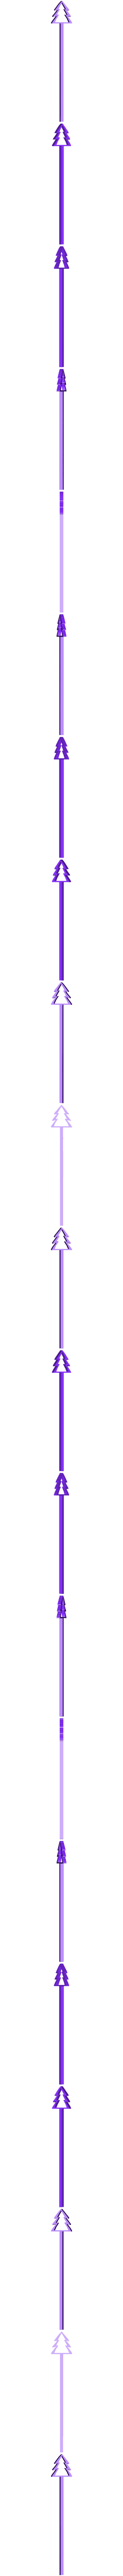 pine_tree_swizzle_stick_3dprintny.stl Download free STL file Holiday Party Picks and Swizzle Sticks • 3D print model, barb_3dprintny